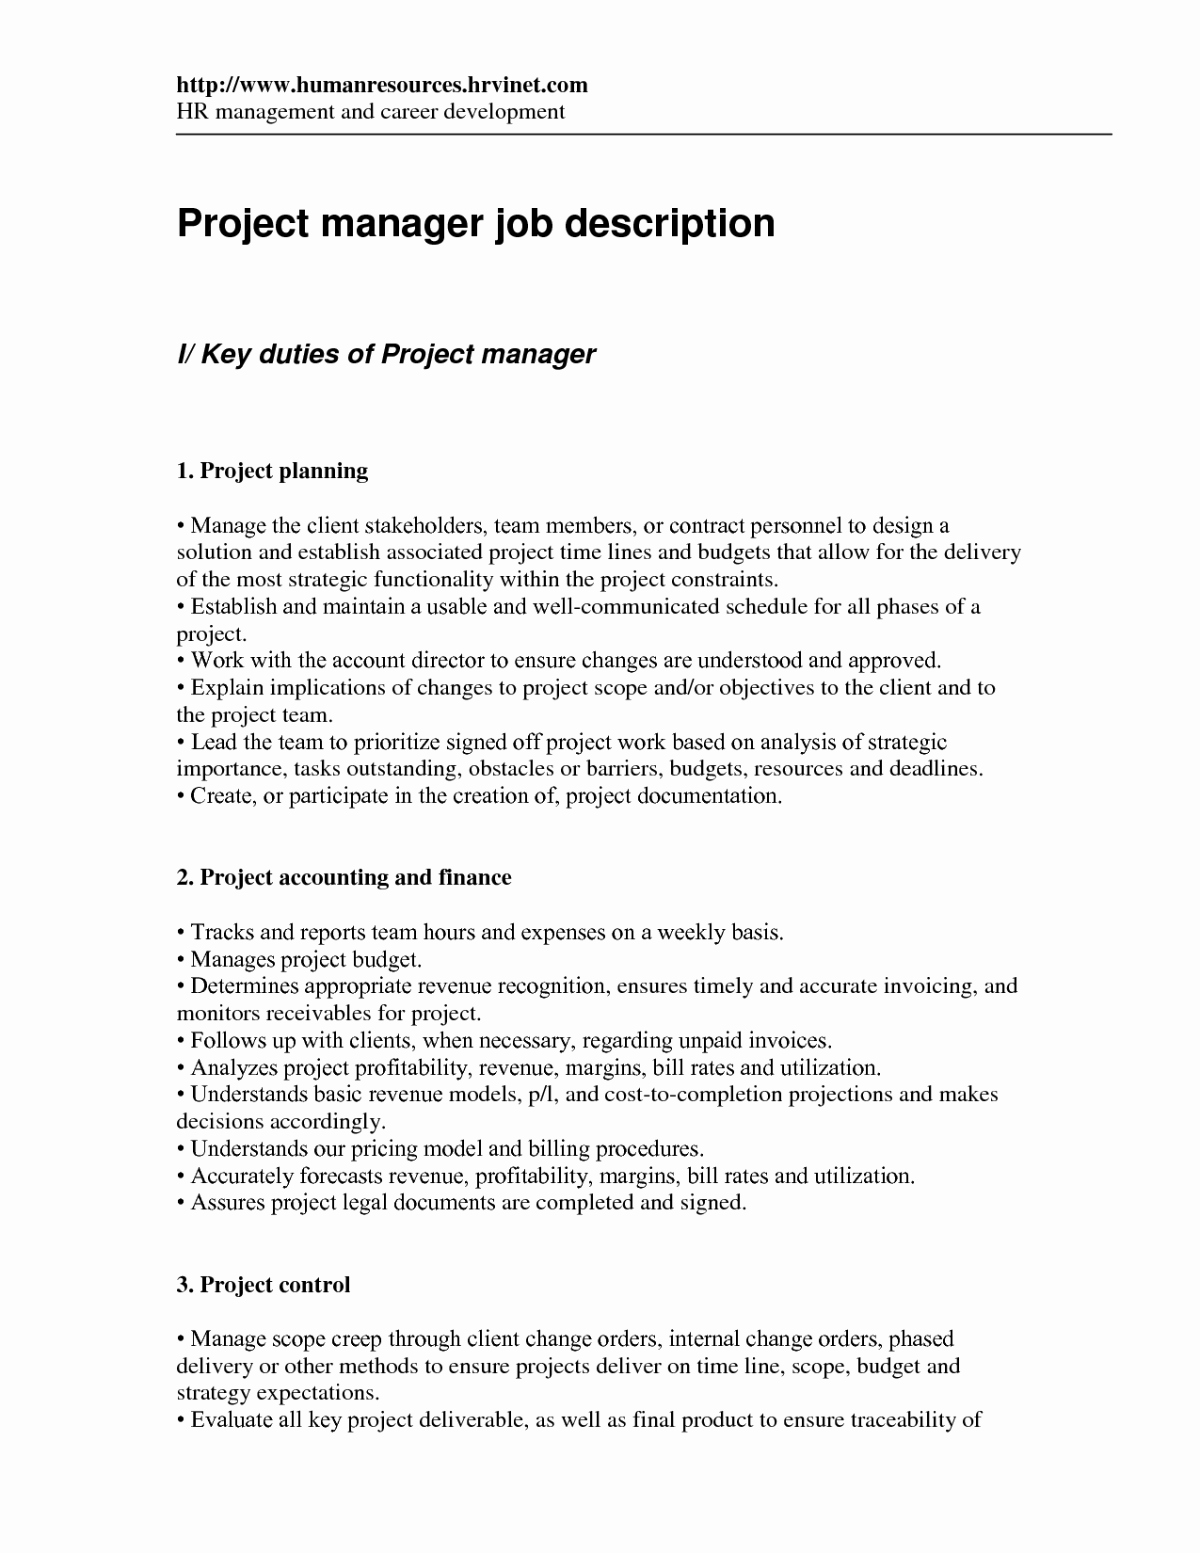 Construction Project Description Awesome Construction Project Management Job Description 0